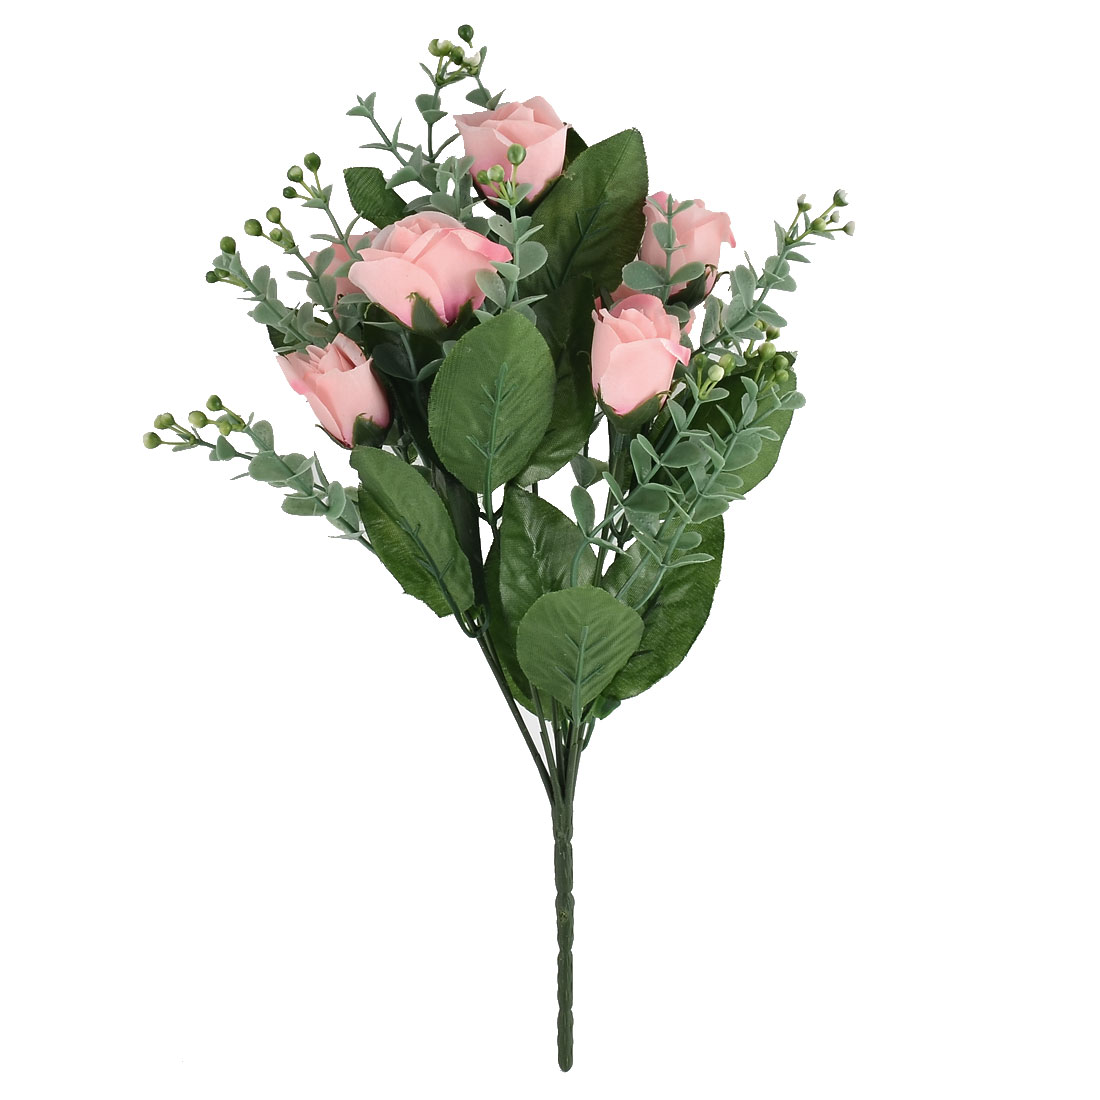 Festival Wedding Adornment 7 Heads Flower Blossom Artificial Rose Bouquet Pink